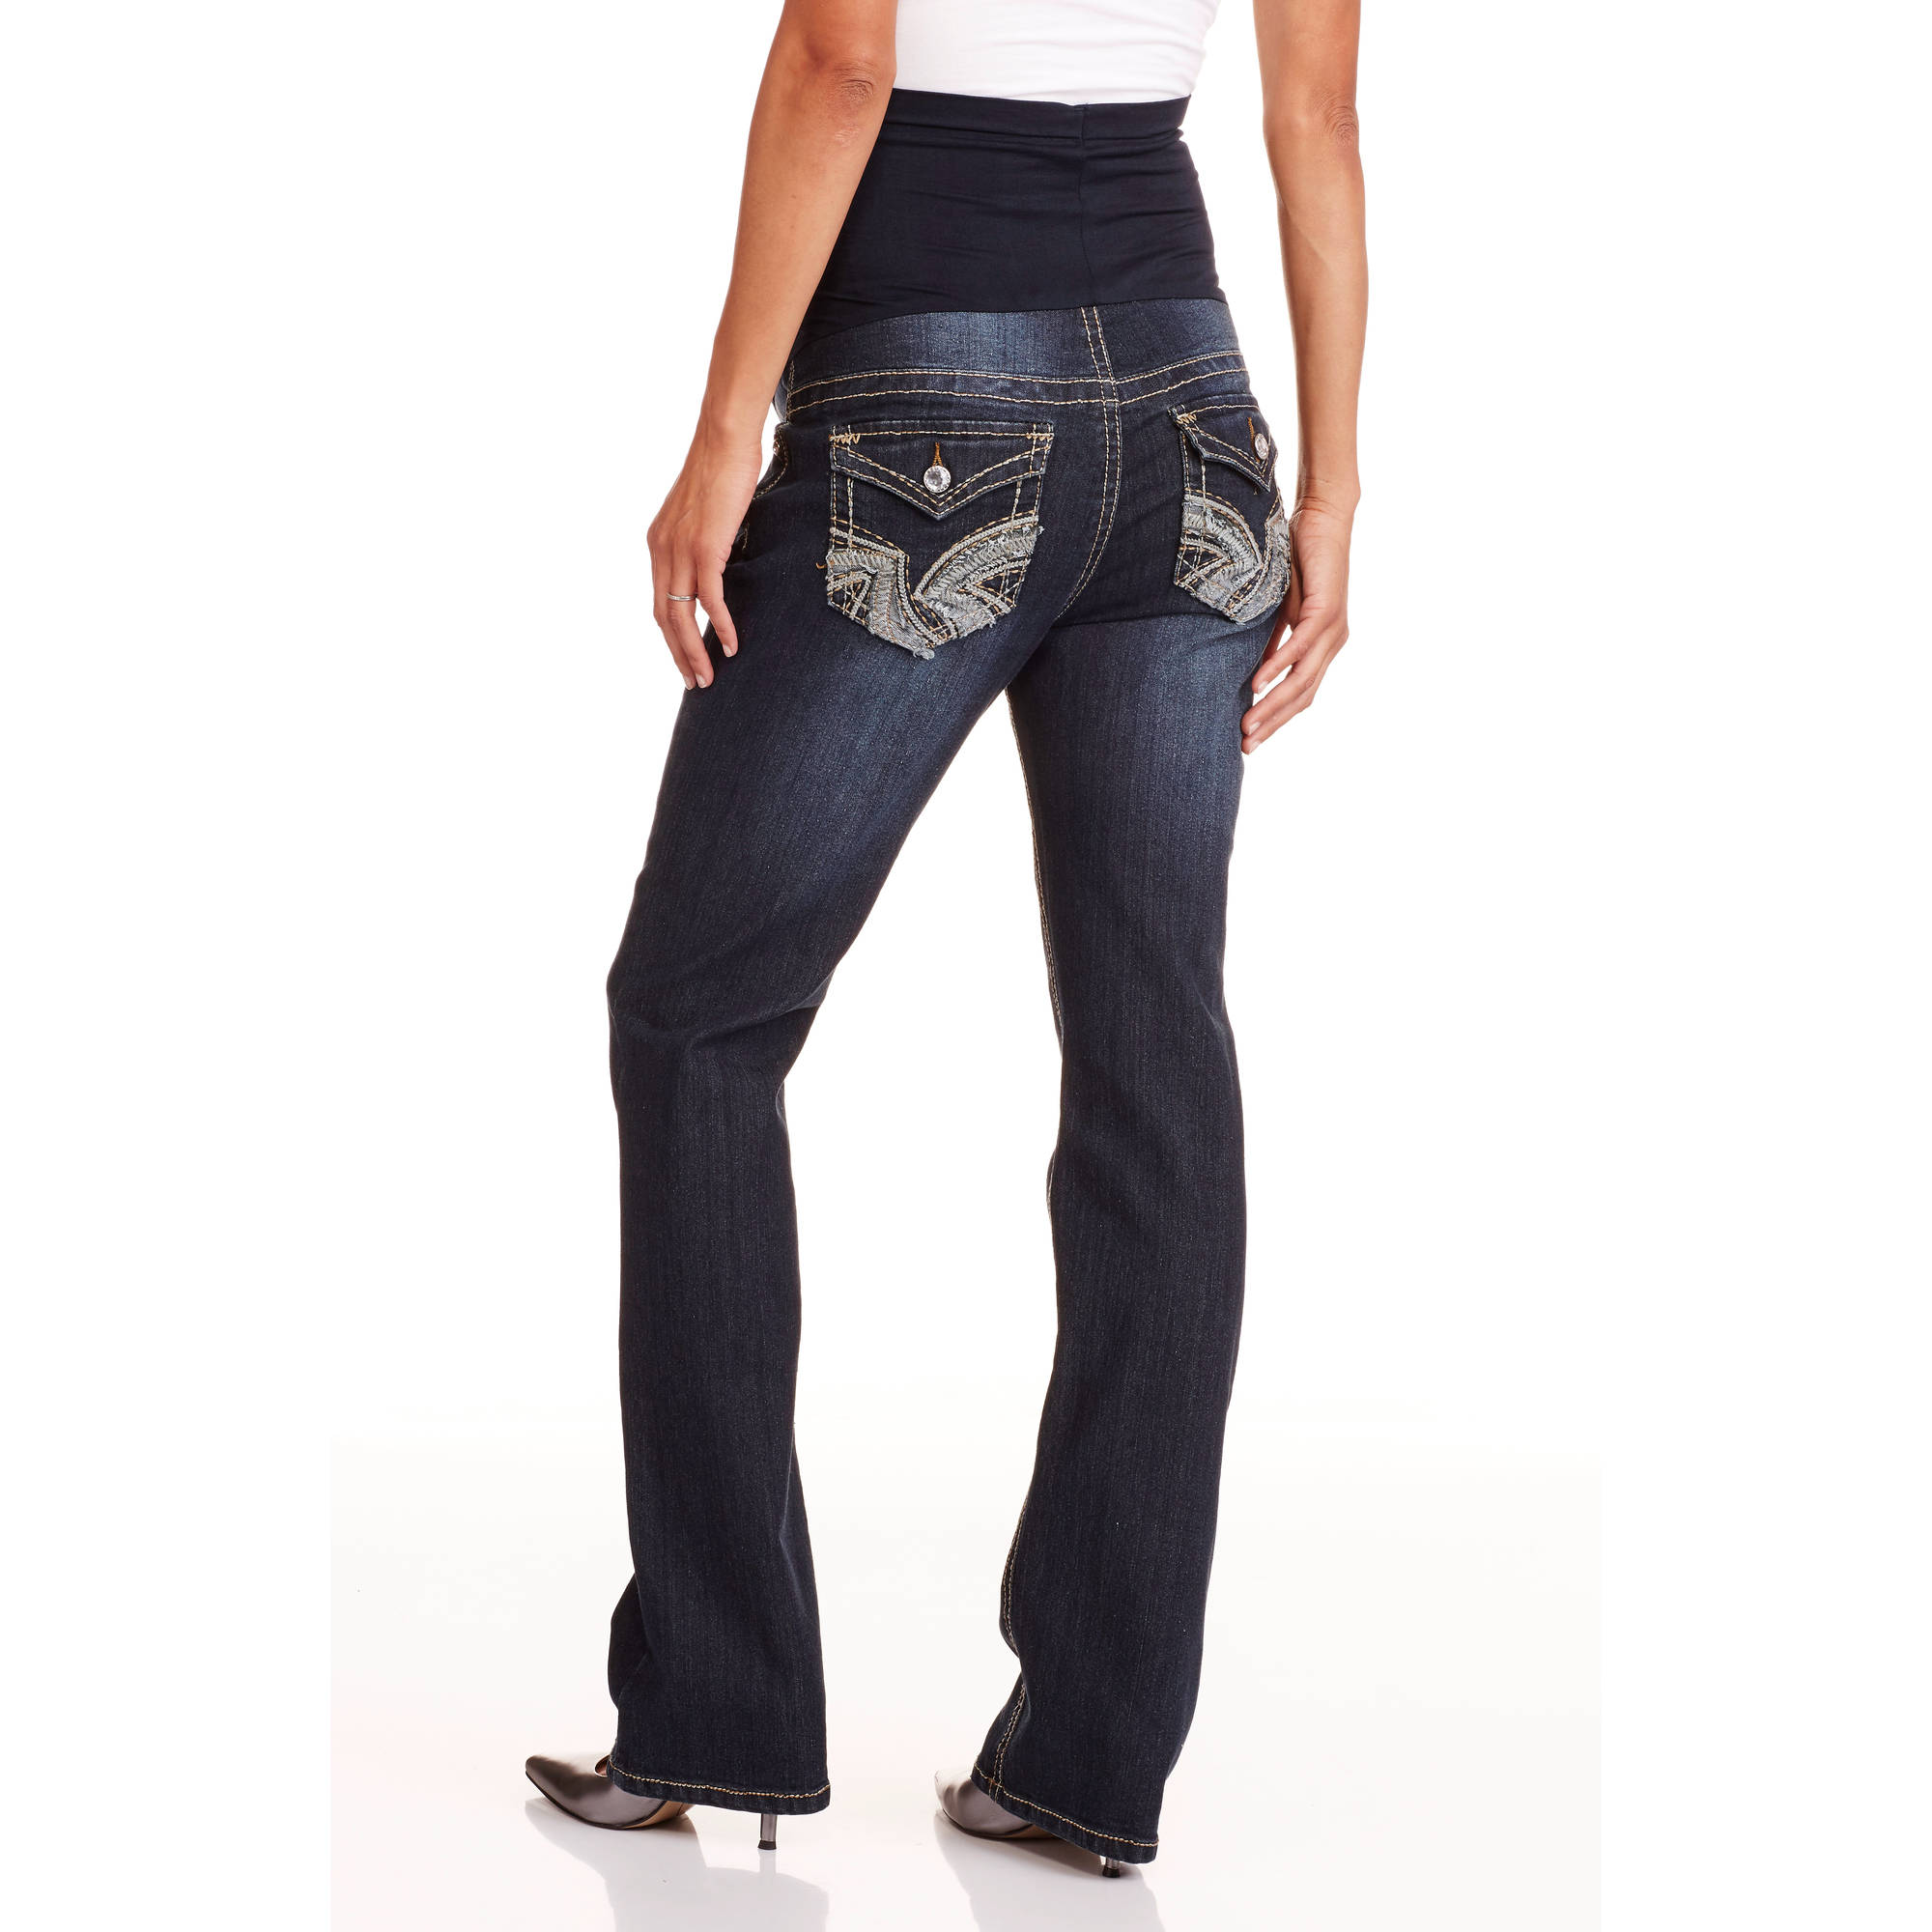 Denim Diva Maternity Full Panel Stitch Embellished Flap Pocket Bootcut Jeans